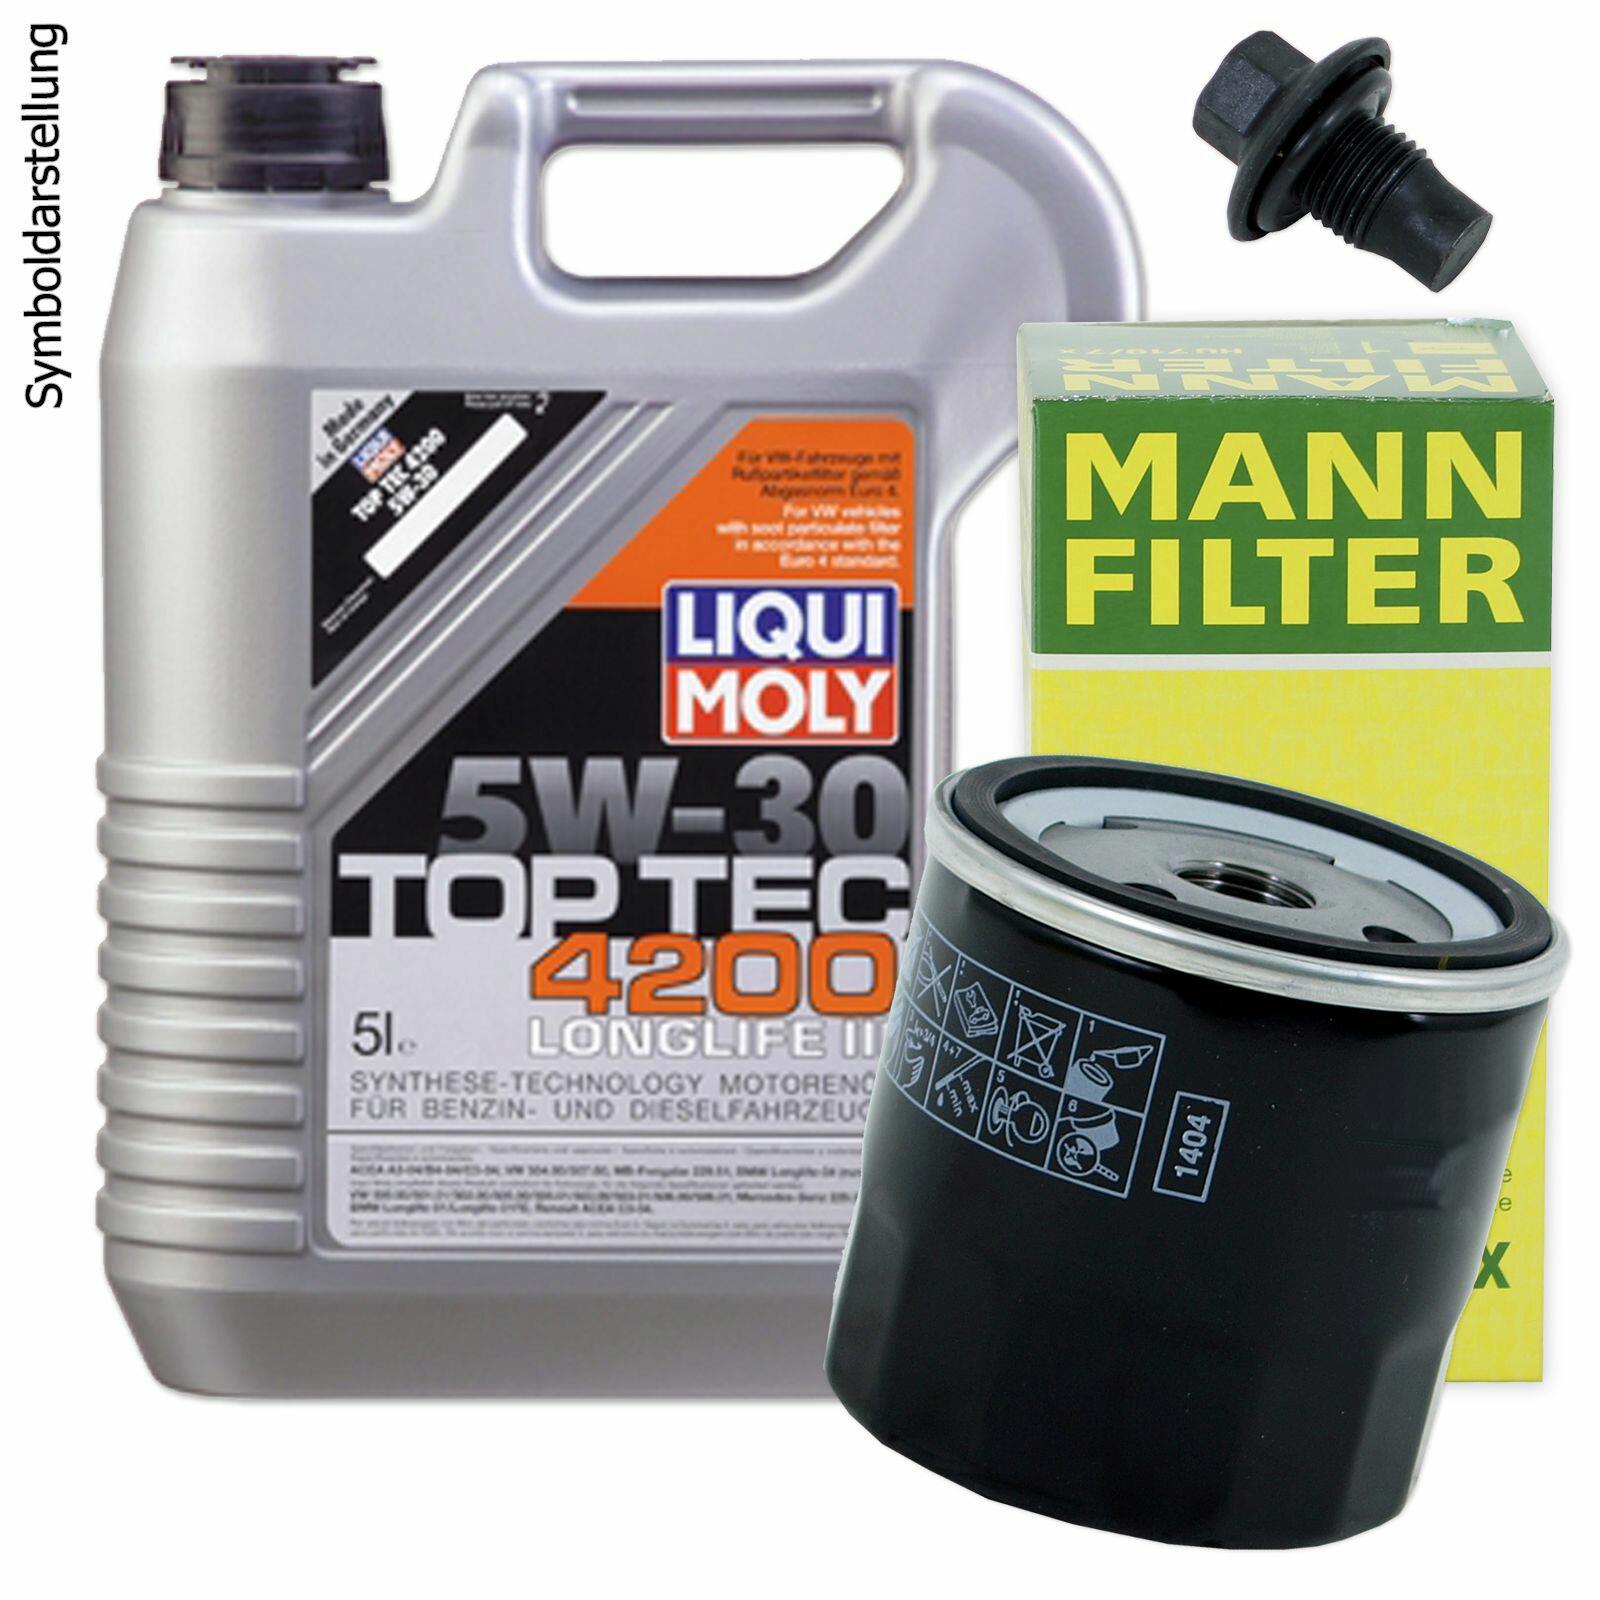 Ölwechsel Set 5L 5W30 Öl Motoröl LIQUI MOLY + MANN Ölfilter + Ablassschraube